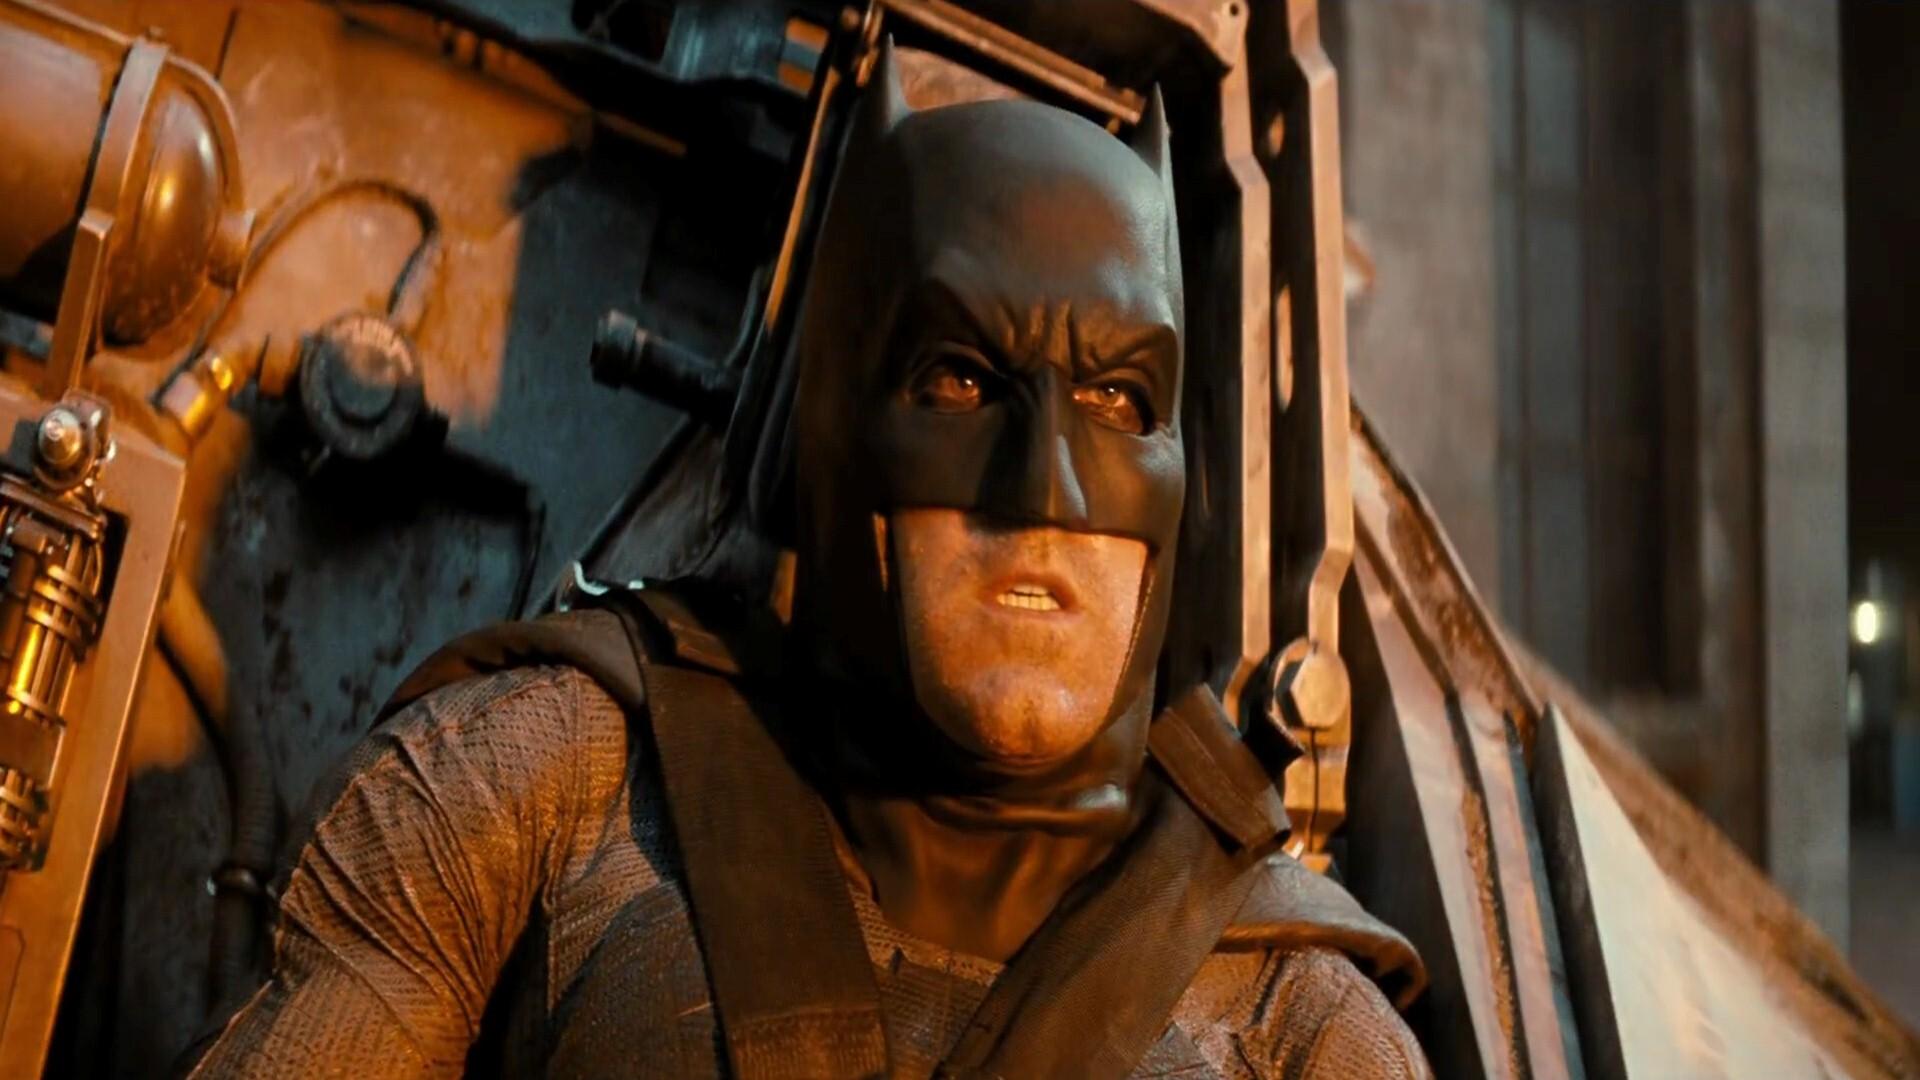 ben affleck as batman in hollywood film hd wallpapers hd wallpapers